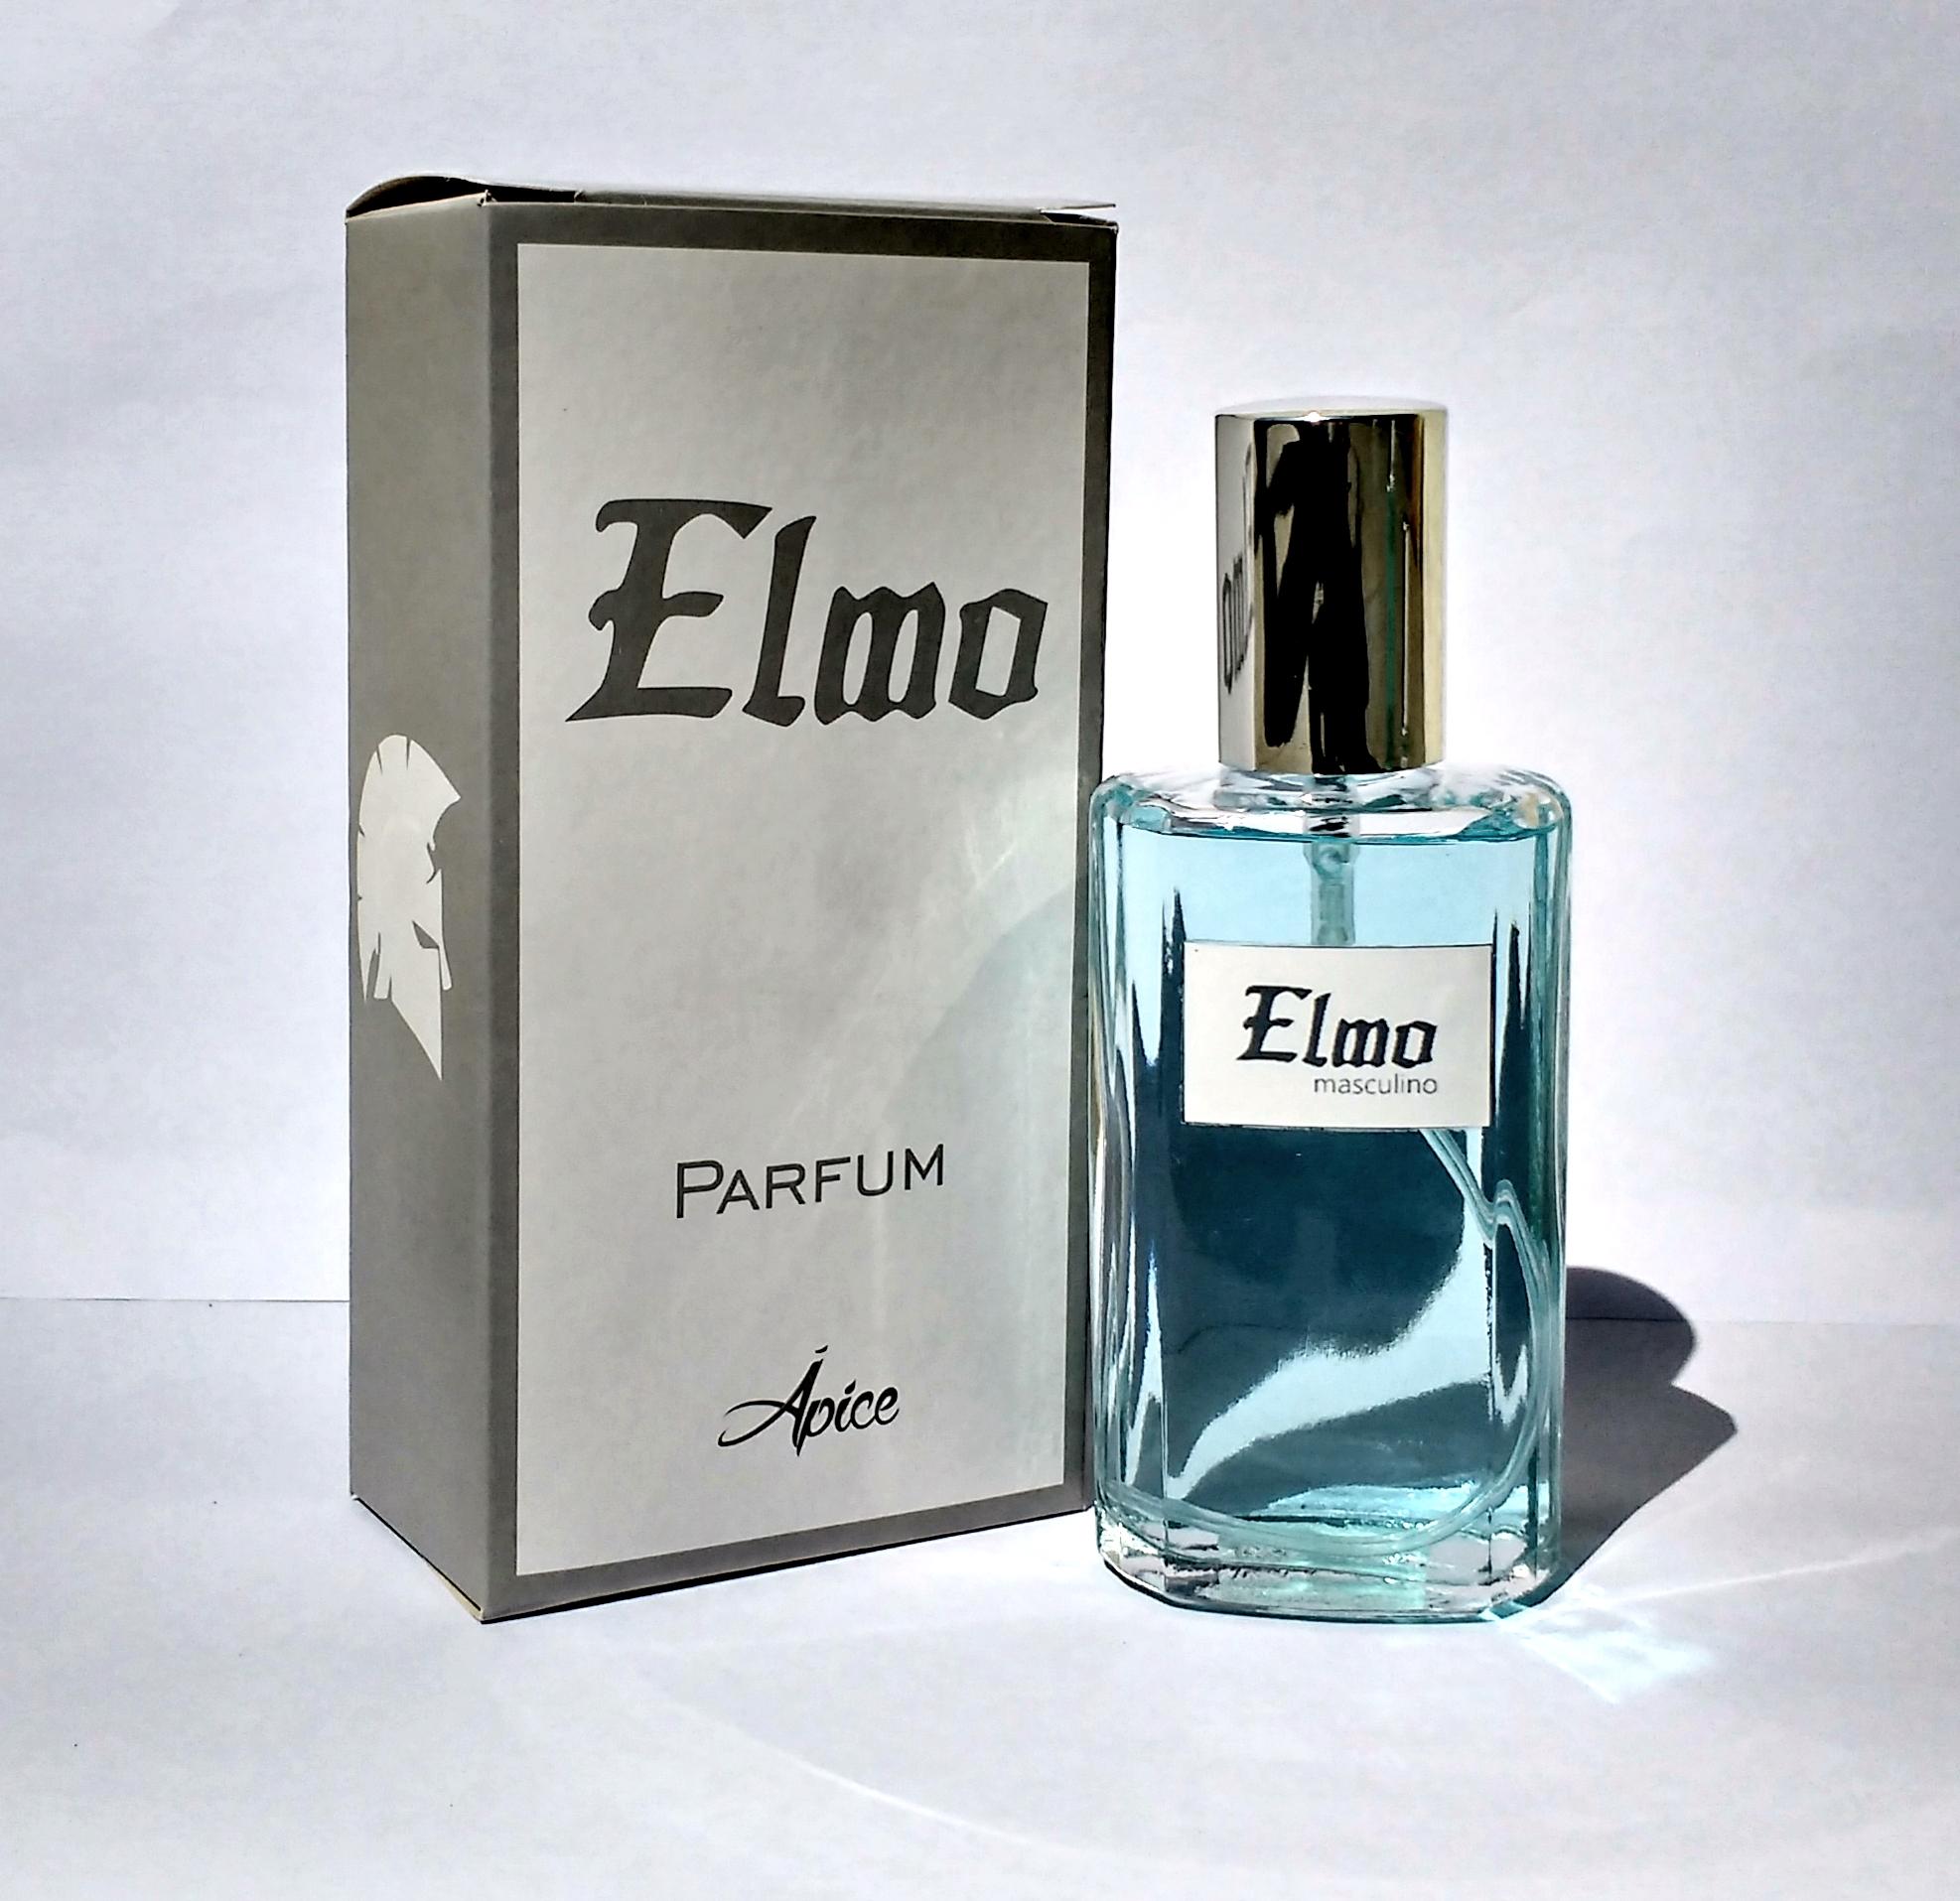 Perfume Bvlgari Man In Black Masculino Alta Fixação 65ml no Elo7   The  Ápice (8EA0E0) 8acc951ae8